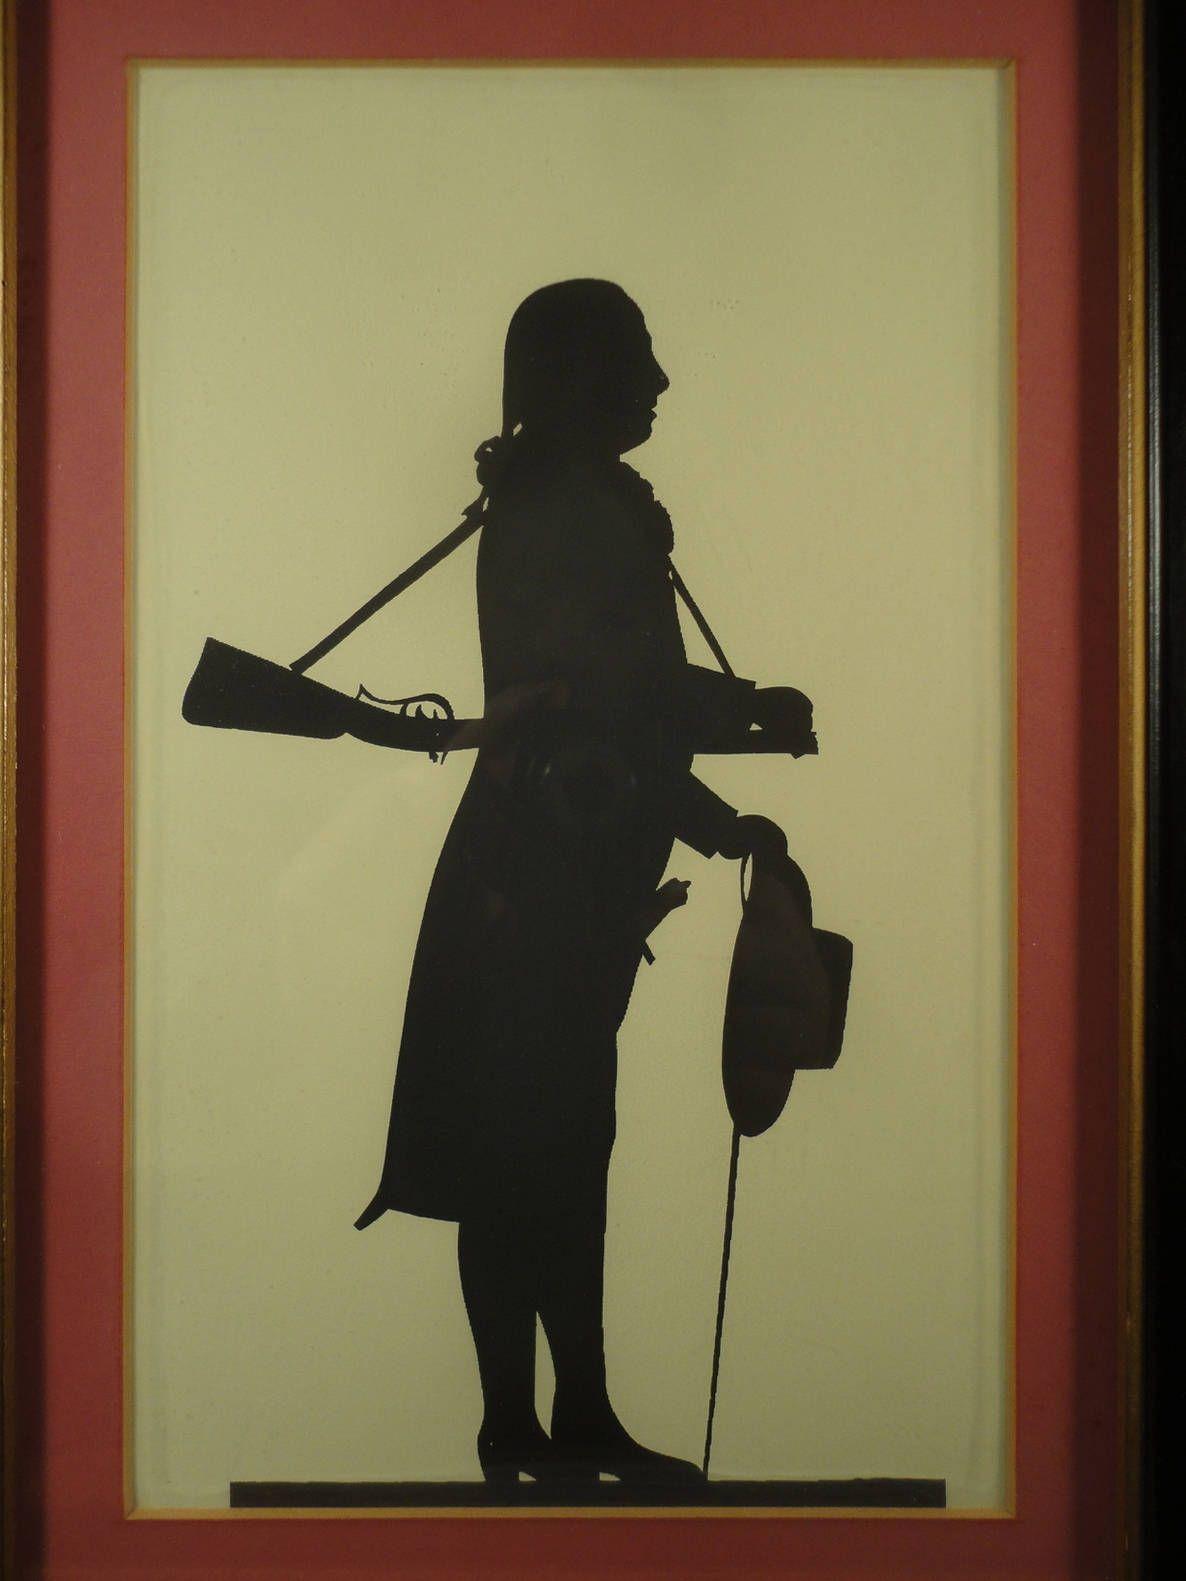 Silhouette Portrait Painting American Revolution Soldier Profile